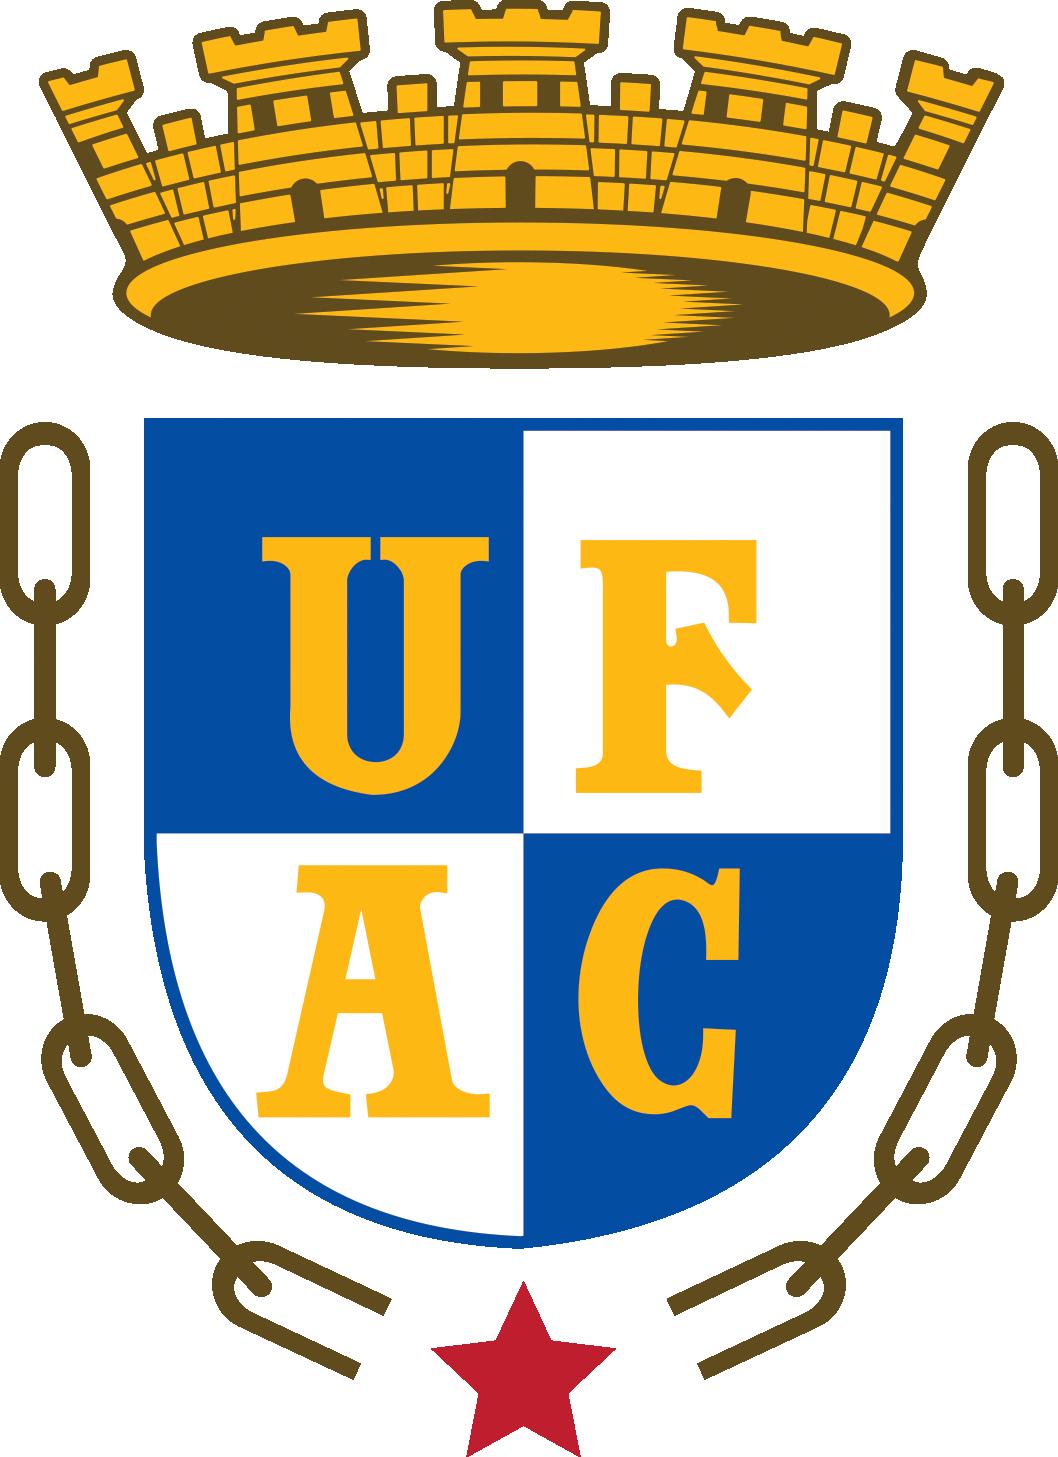 Ufac-brasao.png